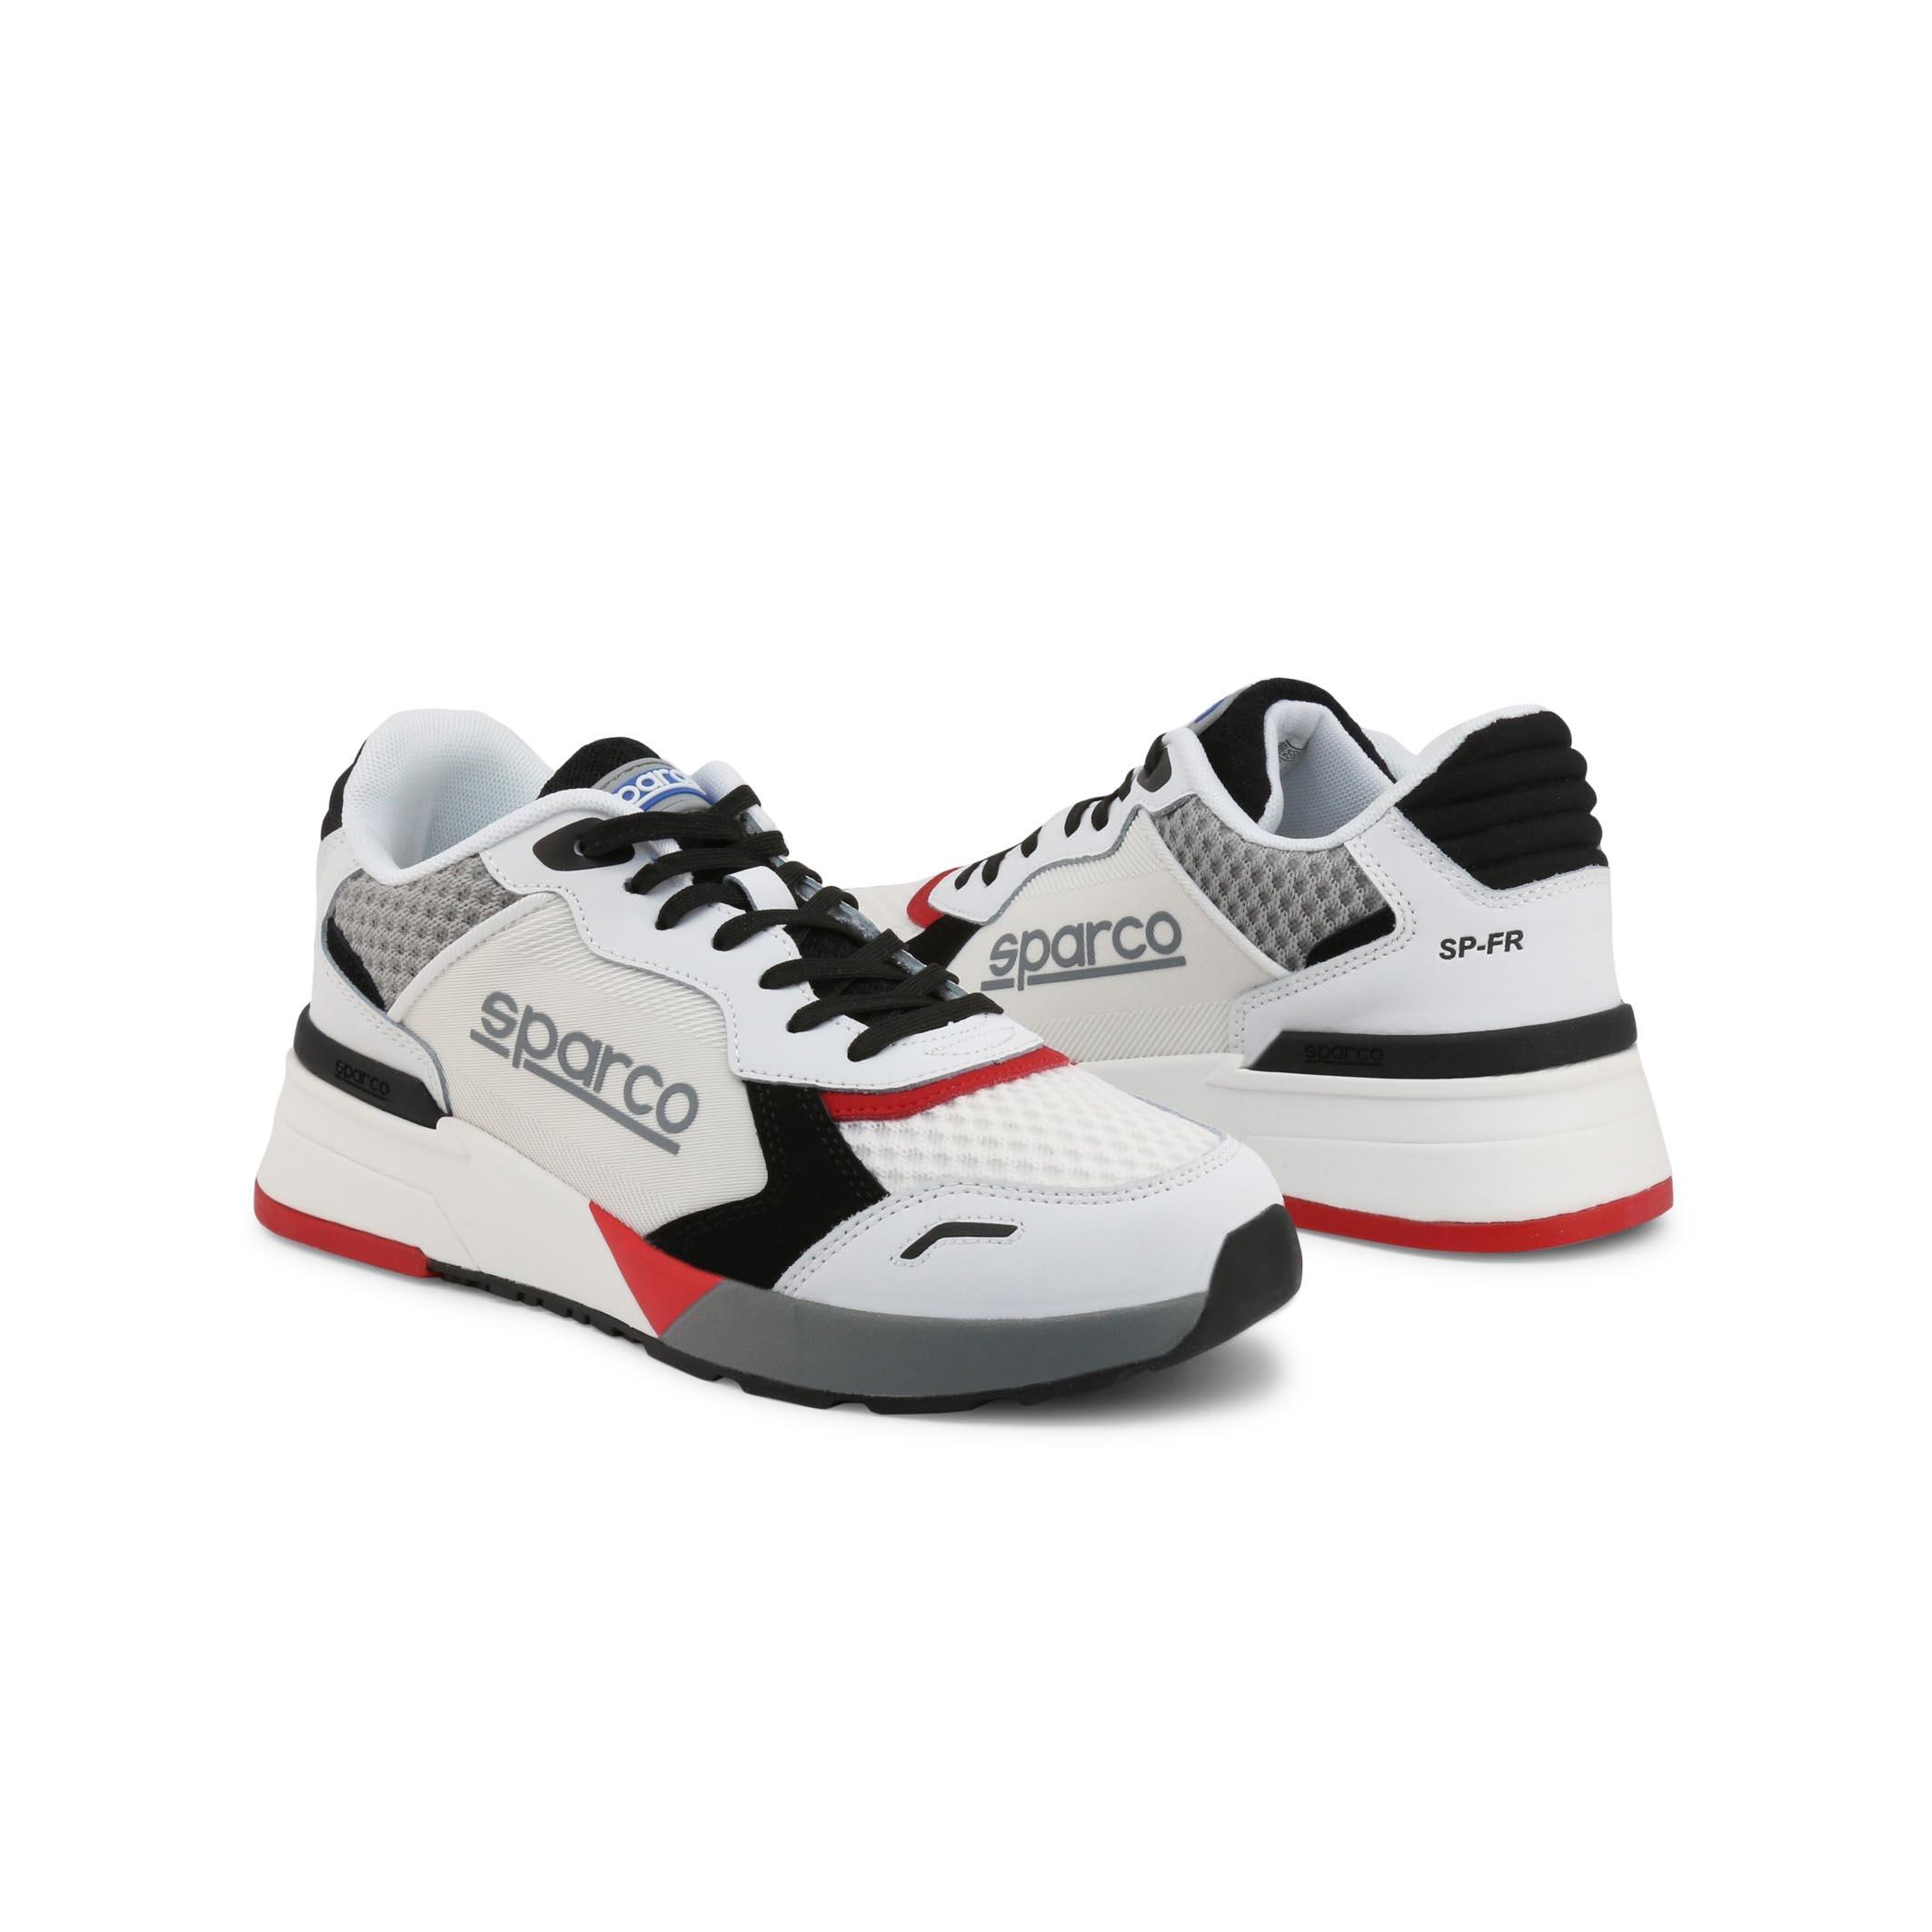 Pantofi sport Sparco SP-FR Alb